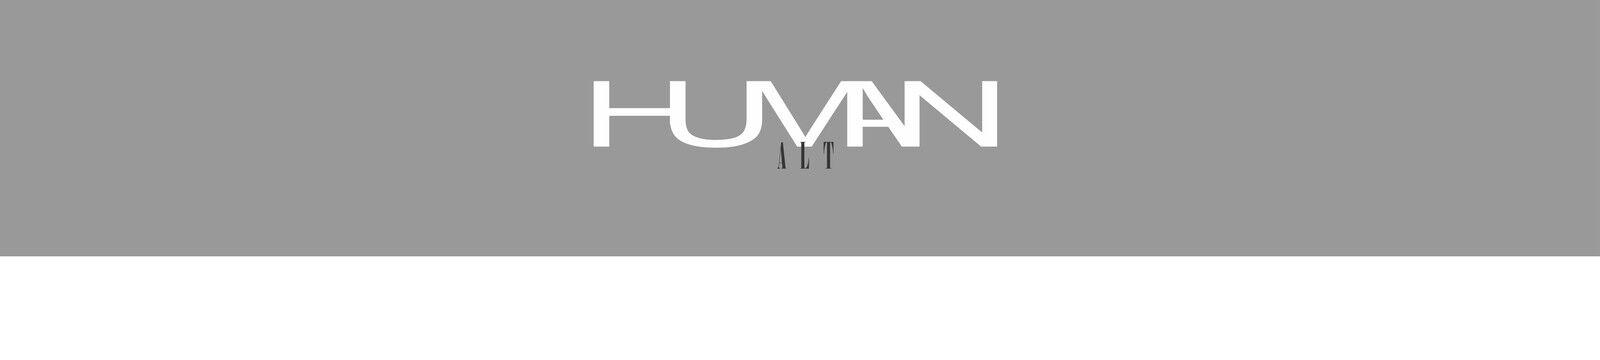 HumanAlt